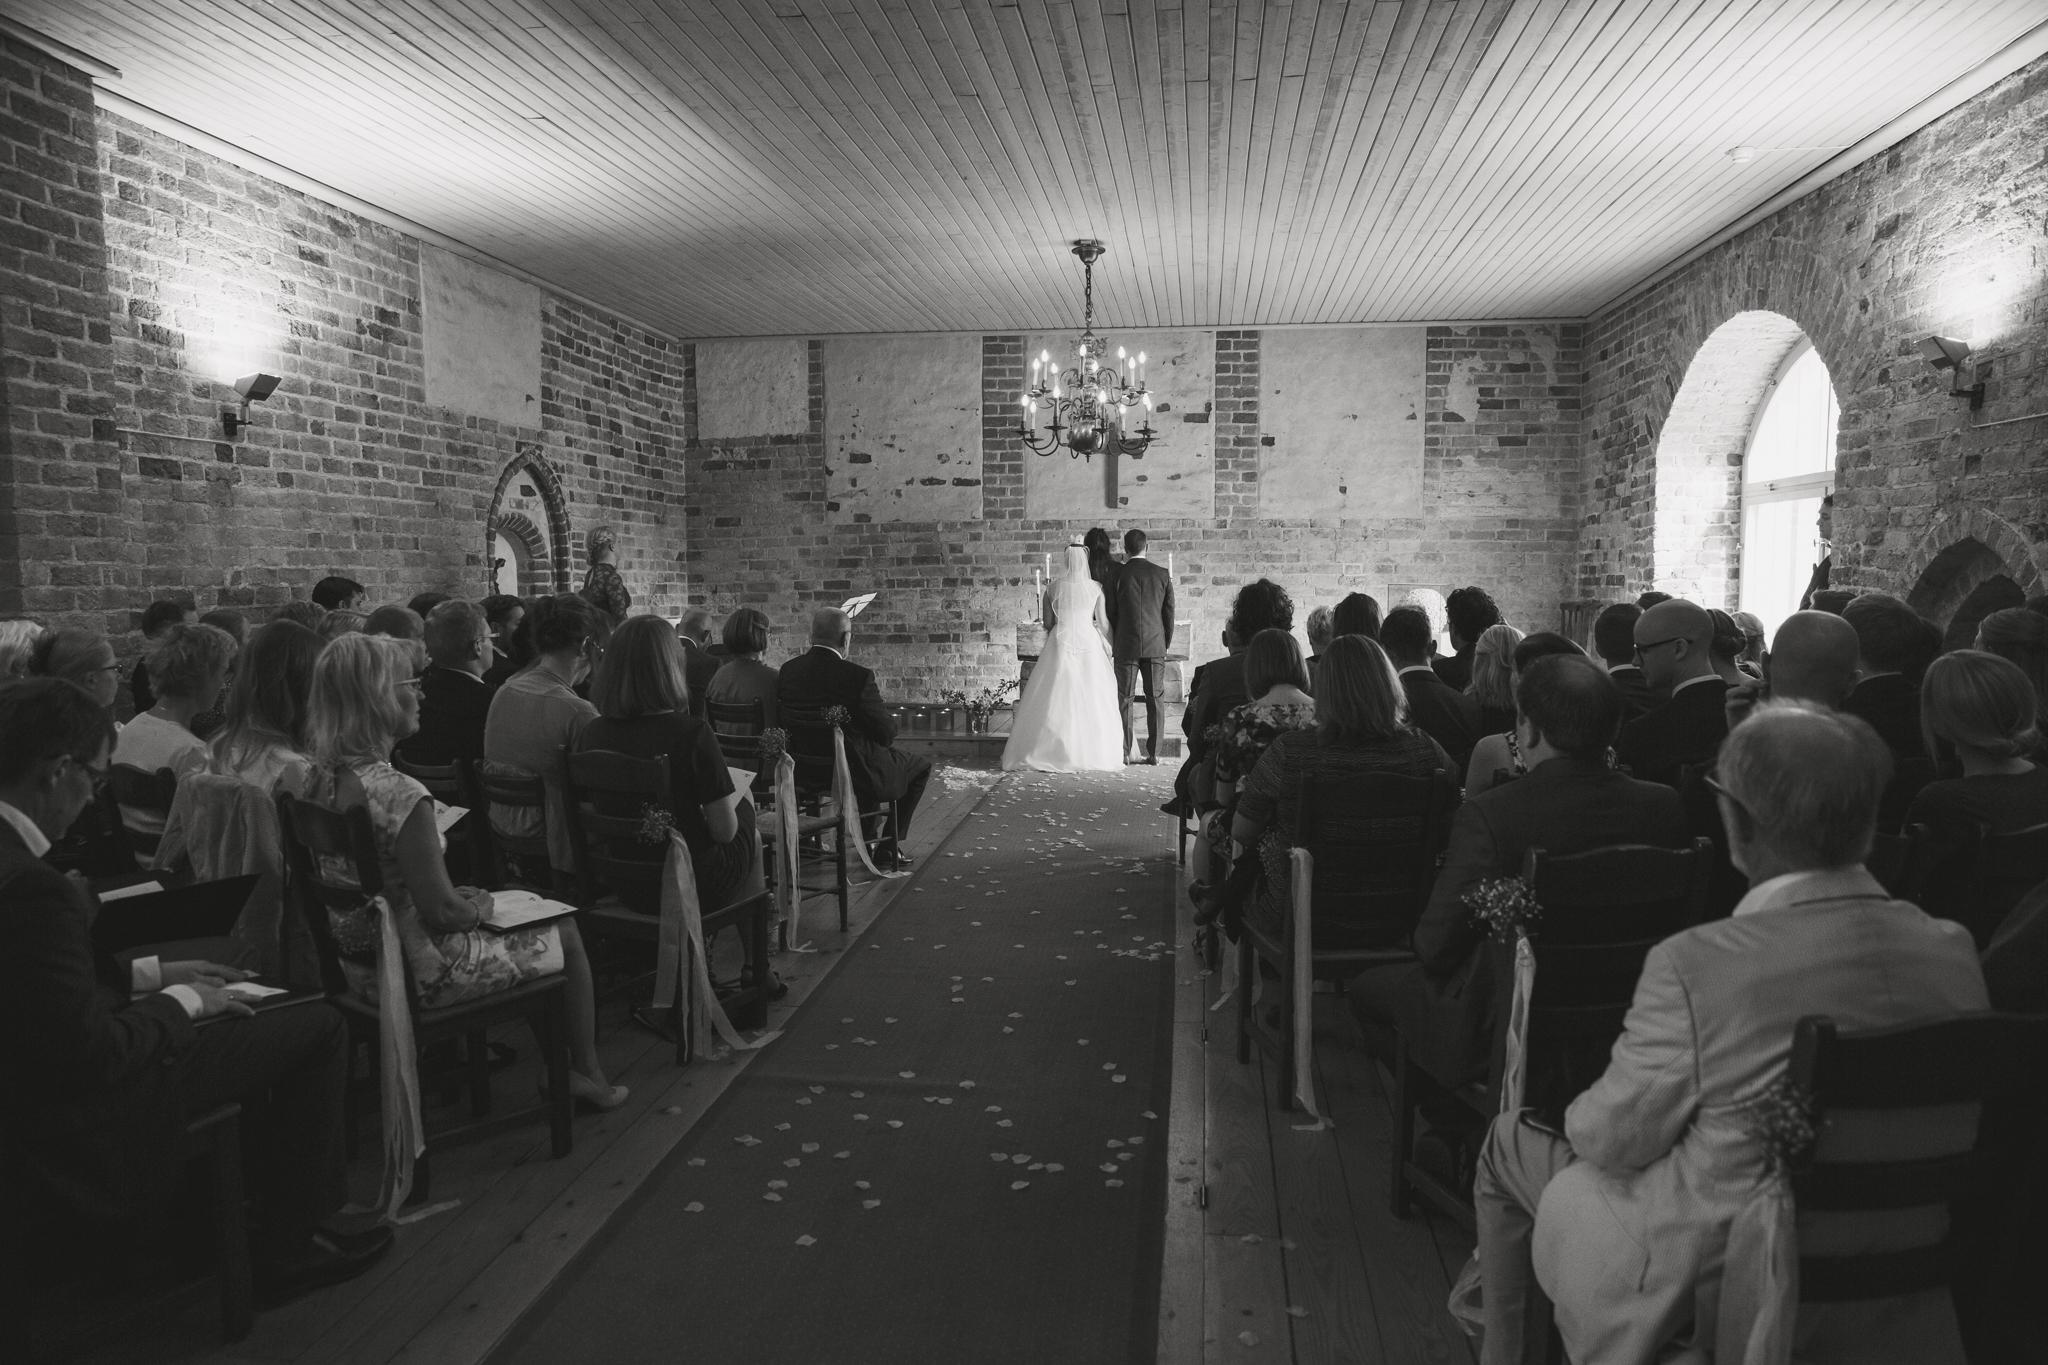 ViOli Photography bröllopsfotograf-Karlshamn-Blekinge-Ronneby-Karlskrona-Sölvesborg-Bromölla-Kristianstad (24 av 35)